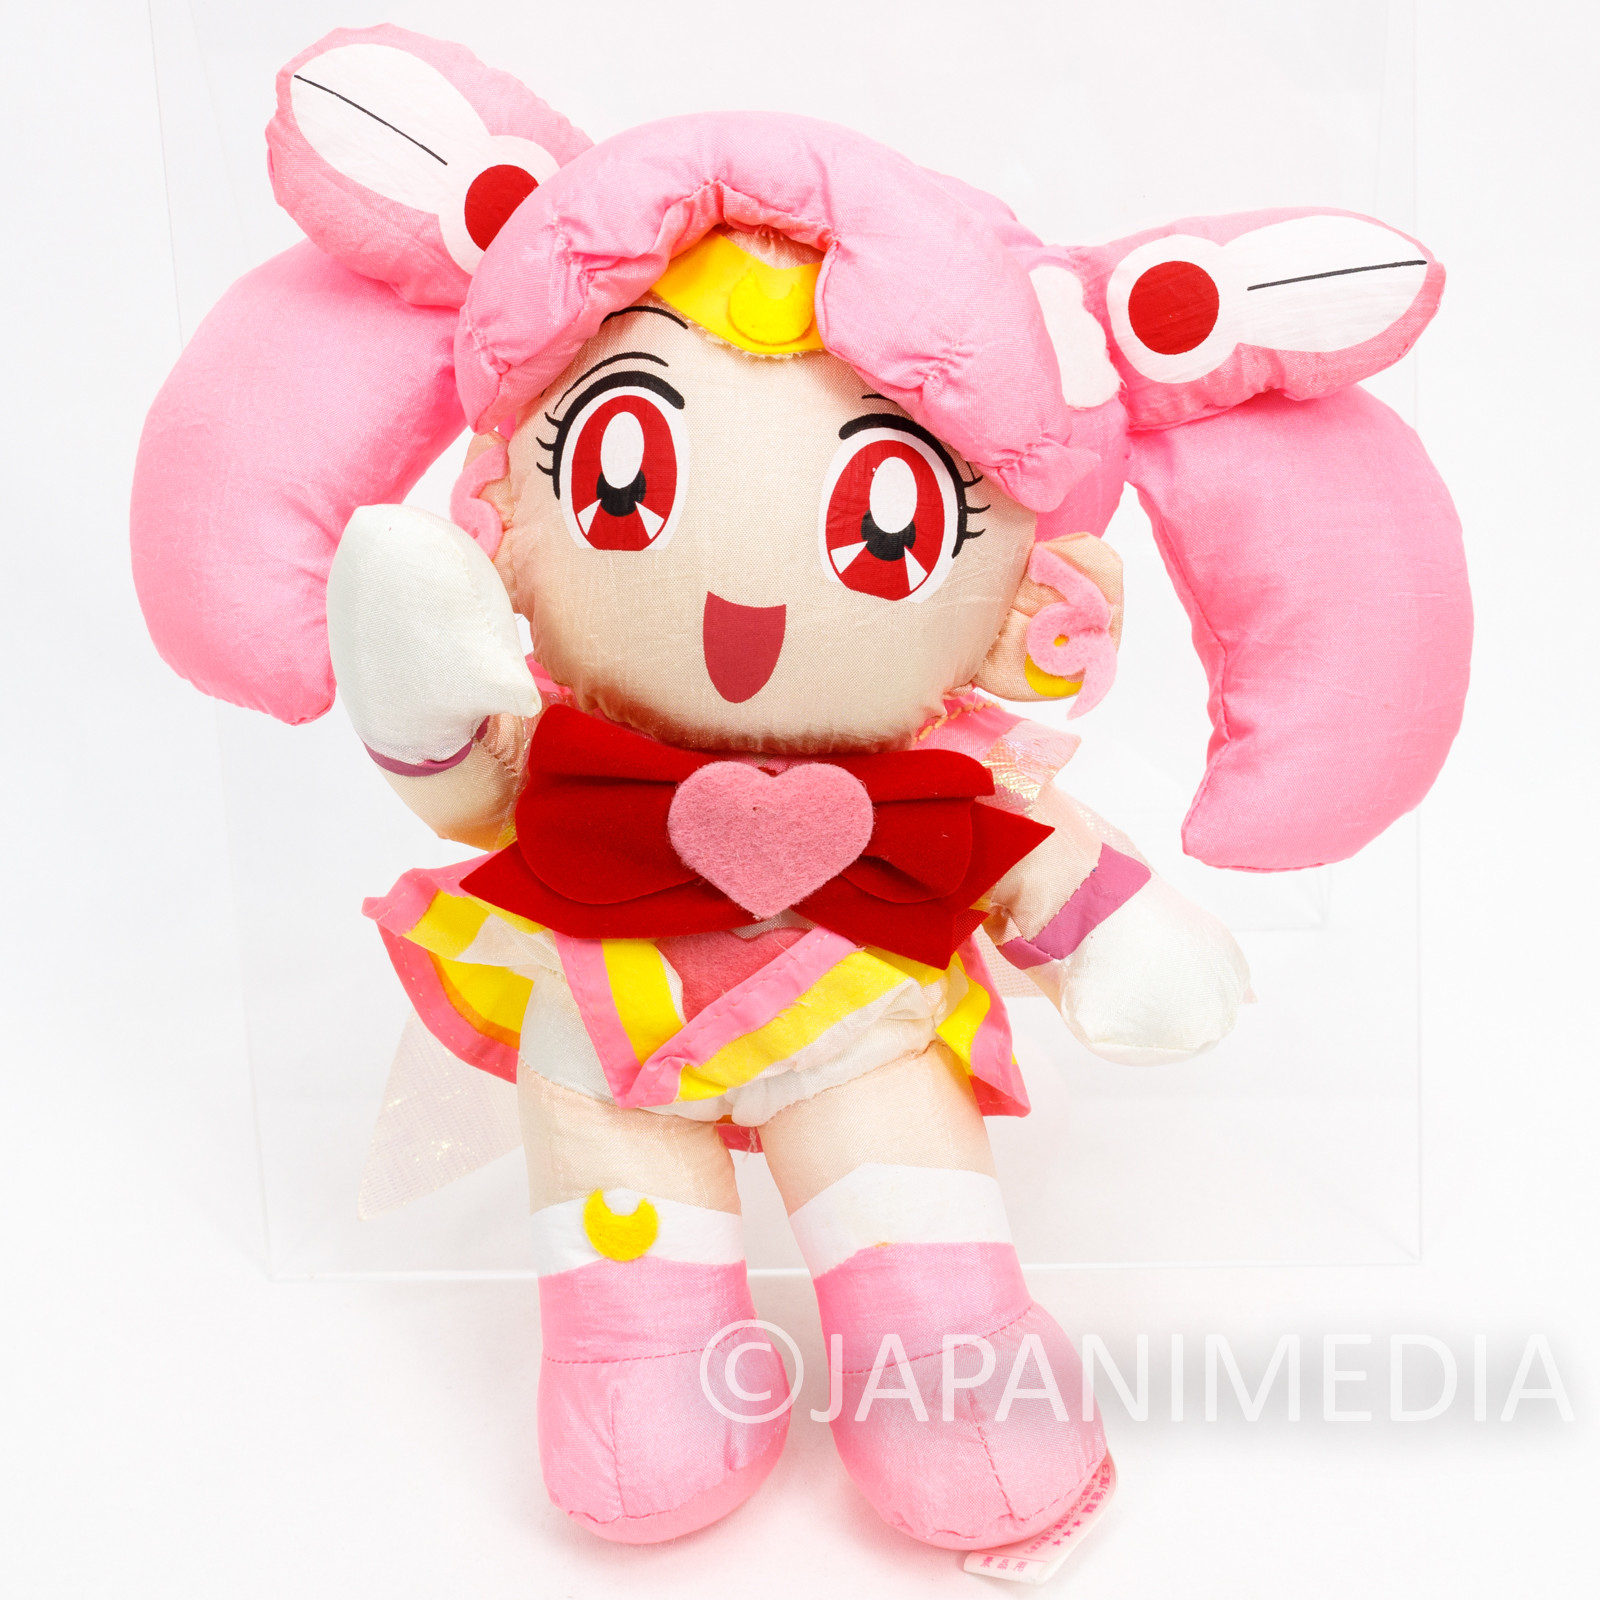 Sailor Moon Super S Sailor Chibi Moon (Chibiusa) Taffeta Plush Doll JAPAN